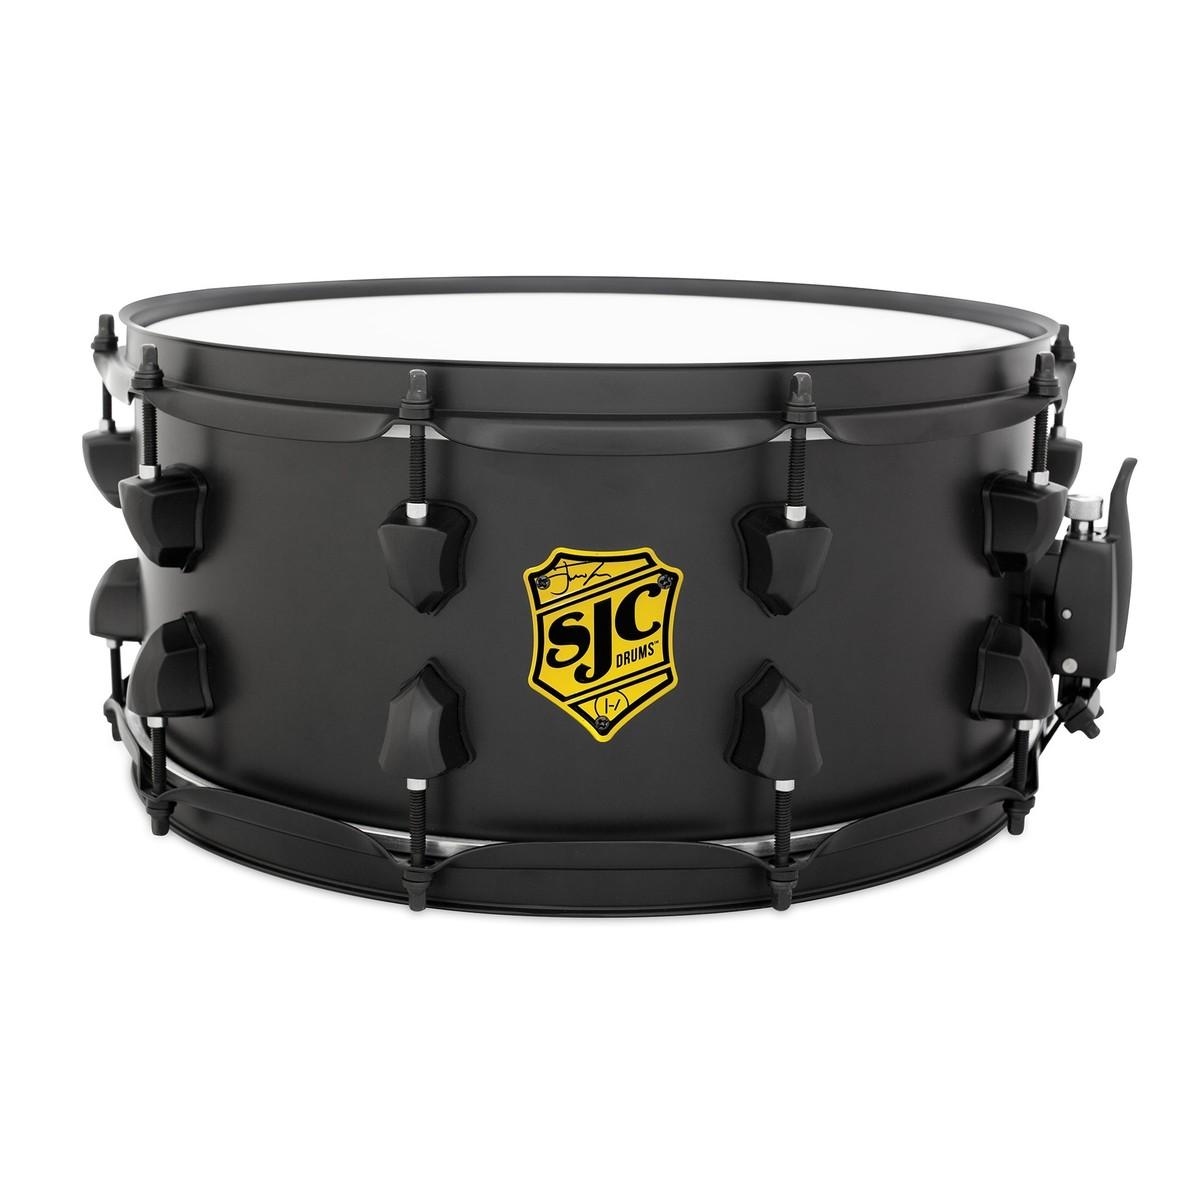 SJC Drums 14'' x 6.5''' Josh Dun Signature Crowd Snare Drum